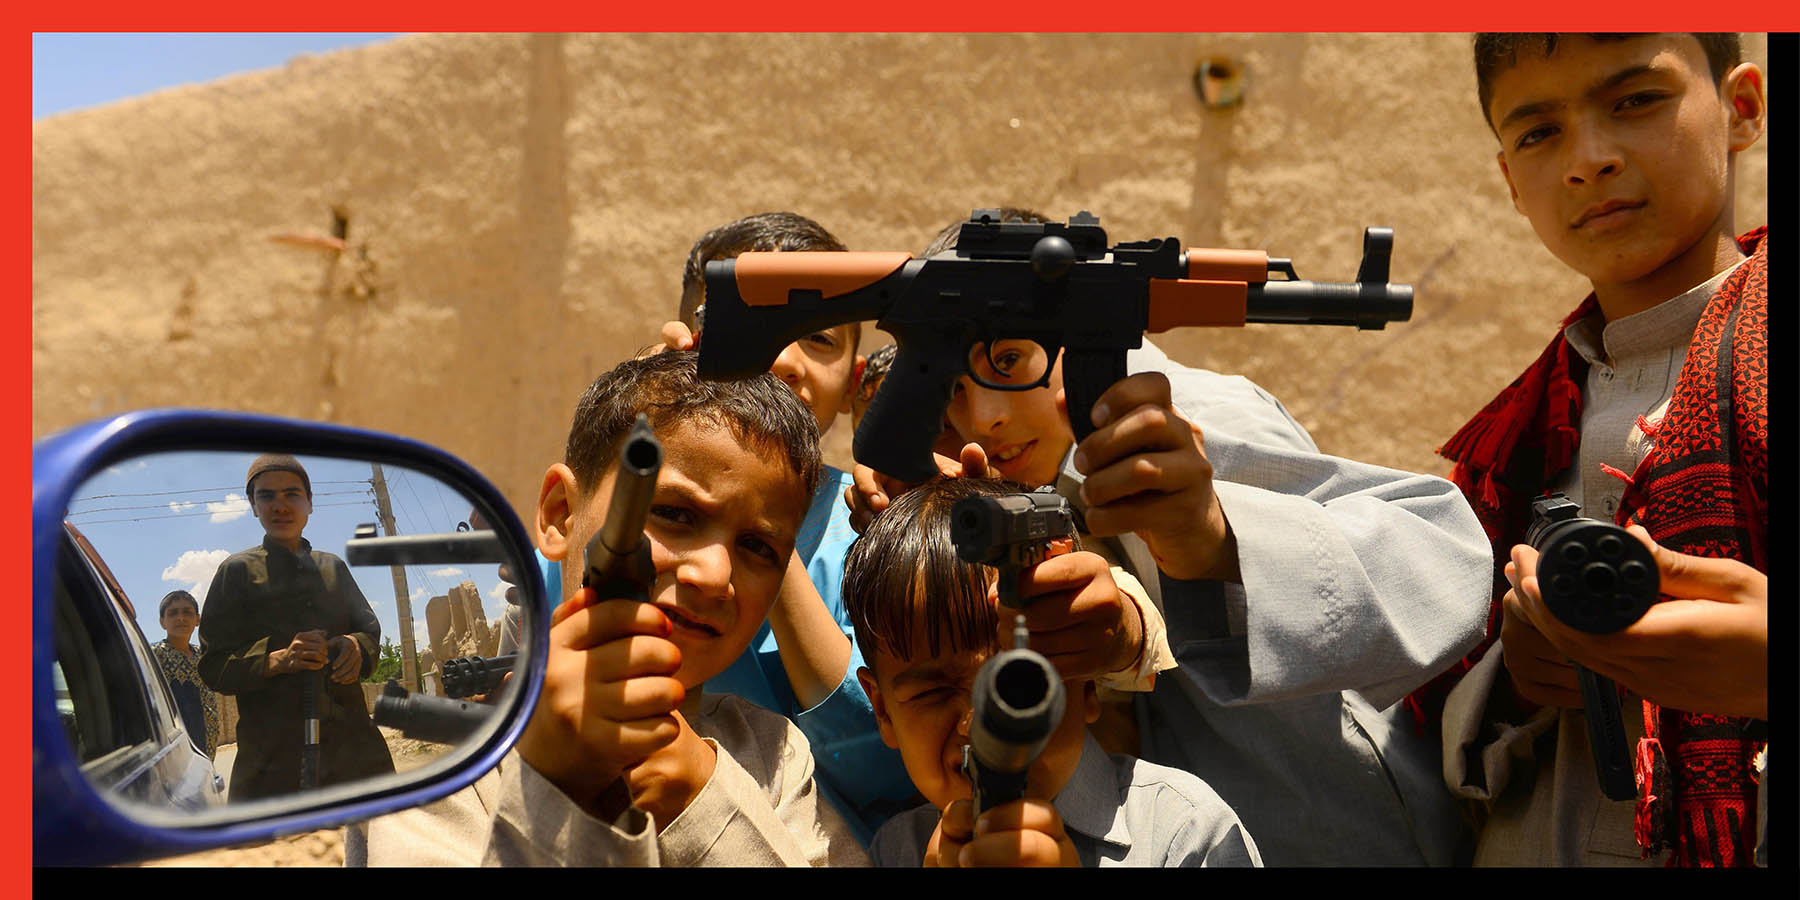 Afghan boys play with plastic guns in Herat, Afghanistan, on June 4.